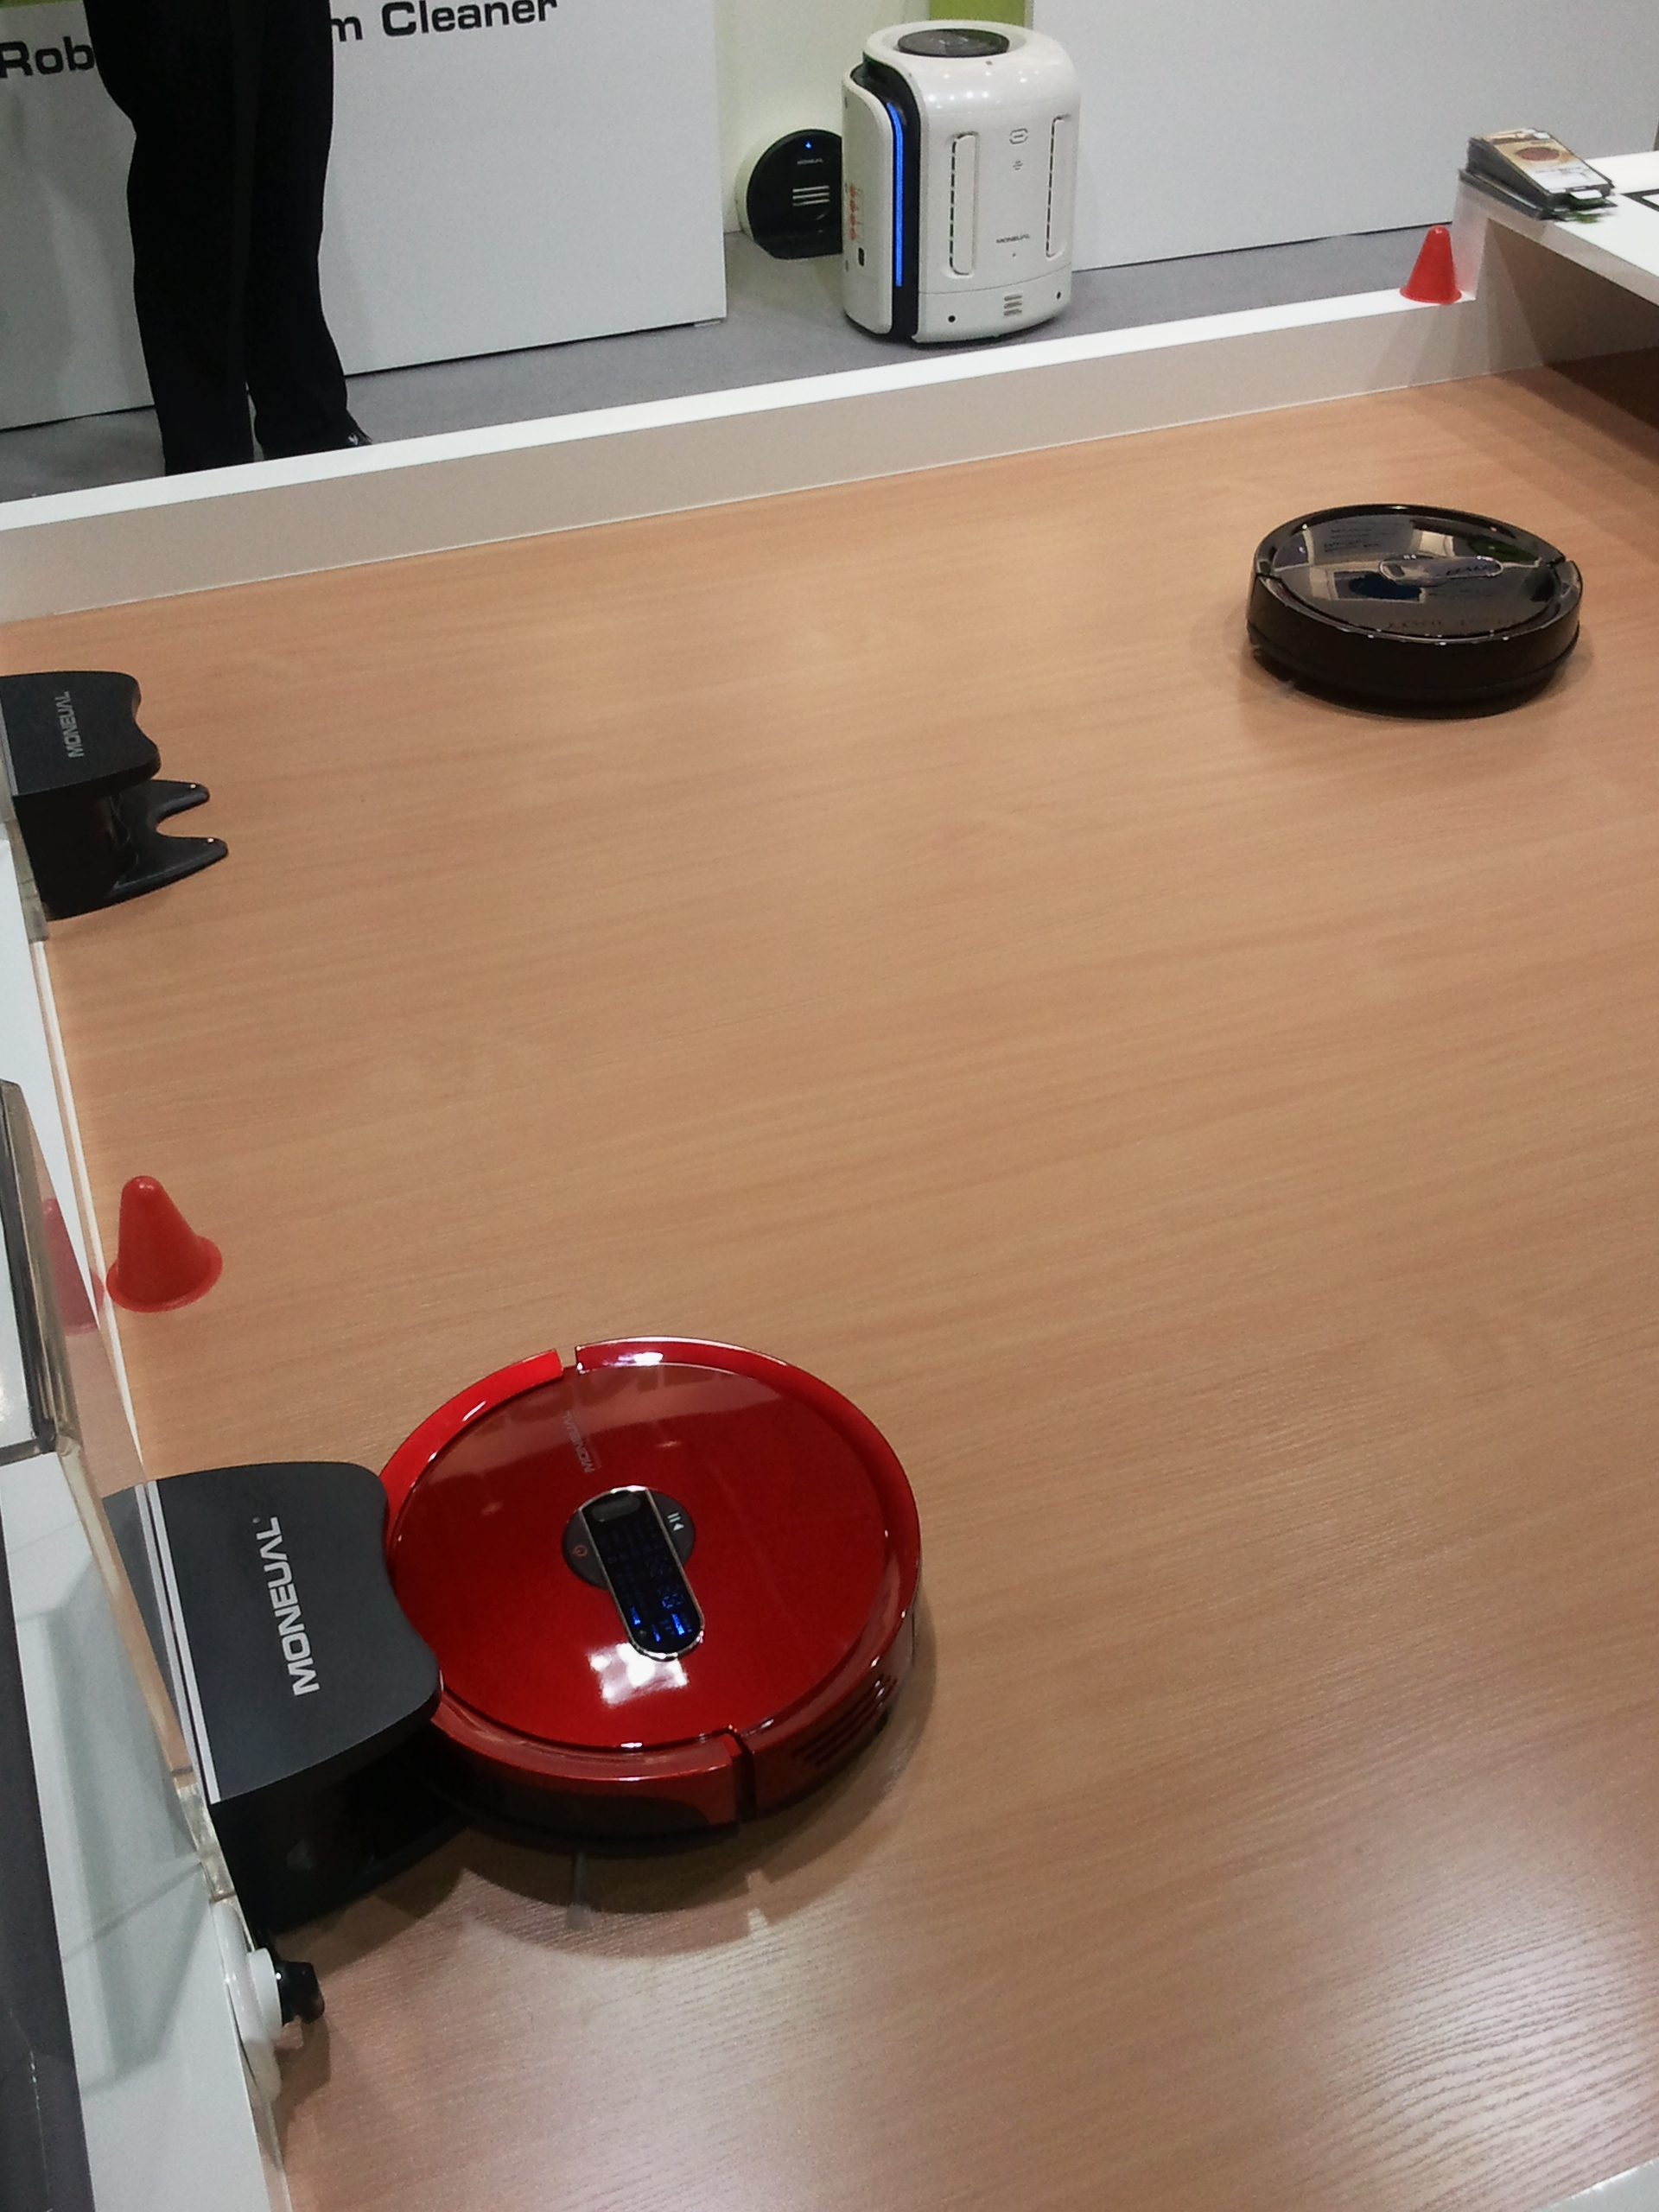 Saub saugende Roboter